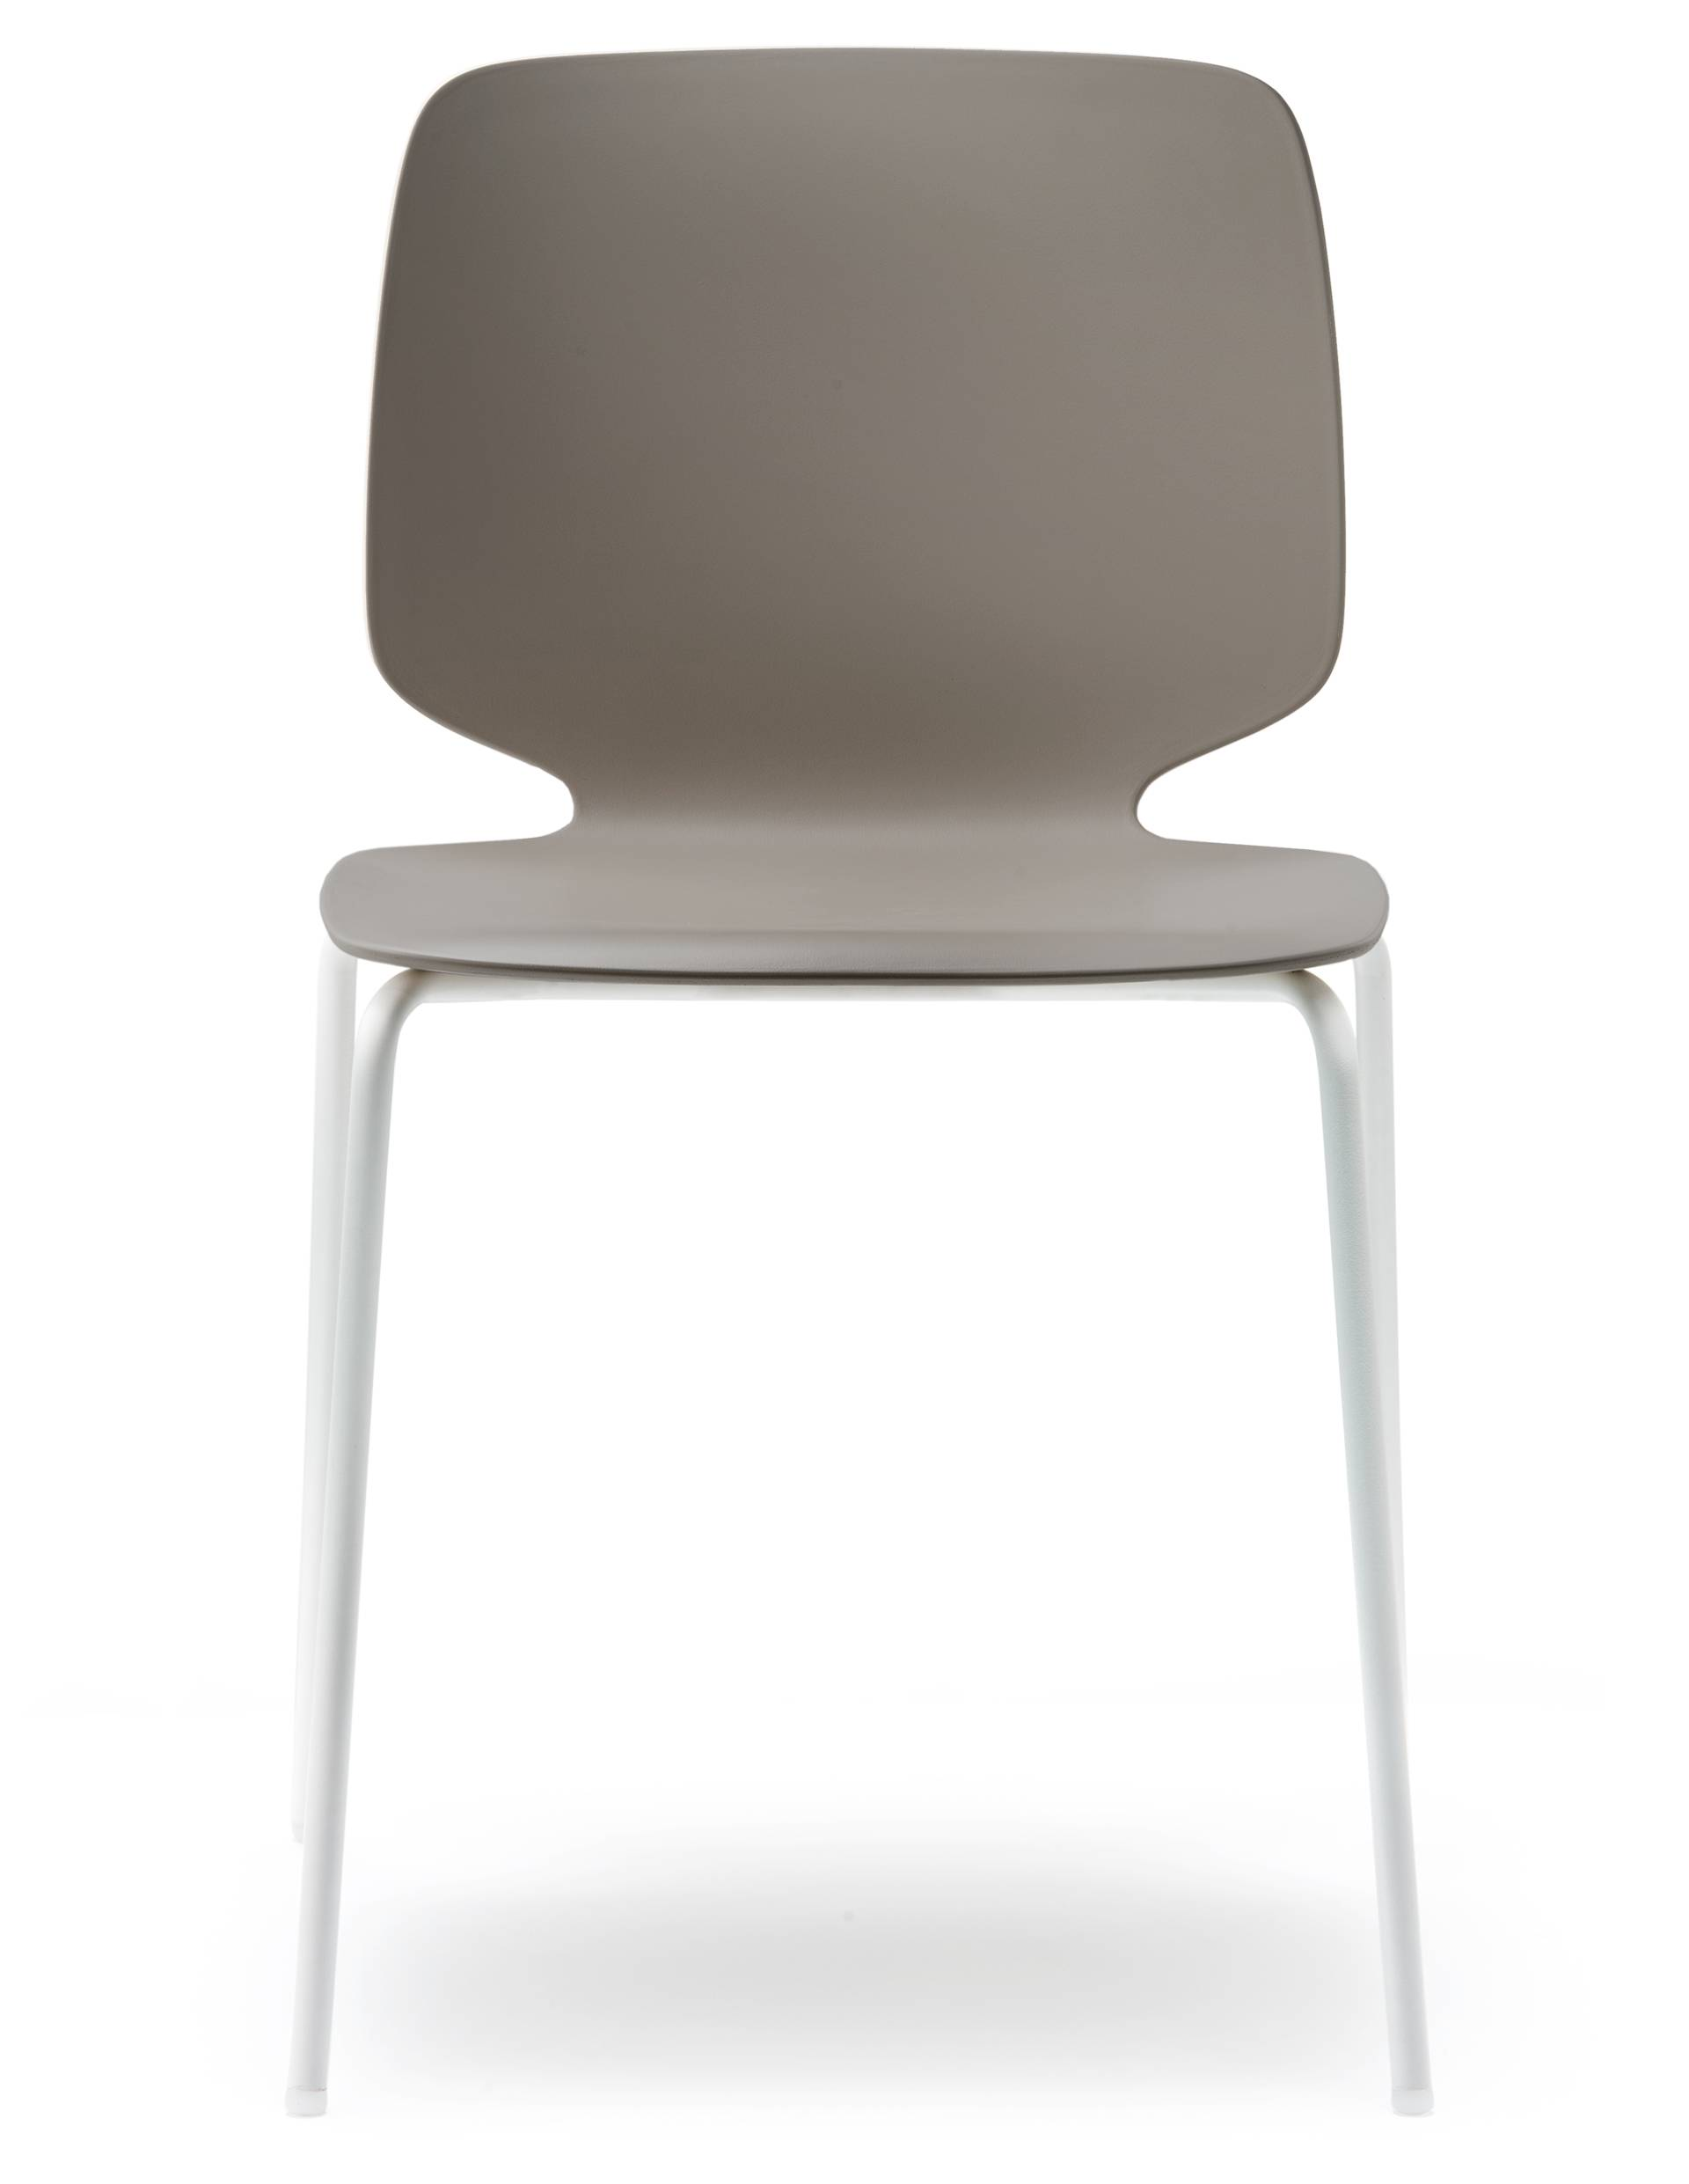 Pedrali sedia Babila 2730, Newformsdesign | Sedie Design ...